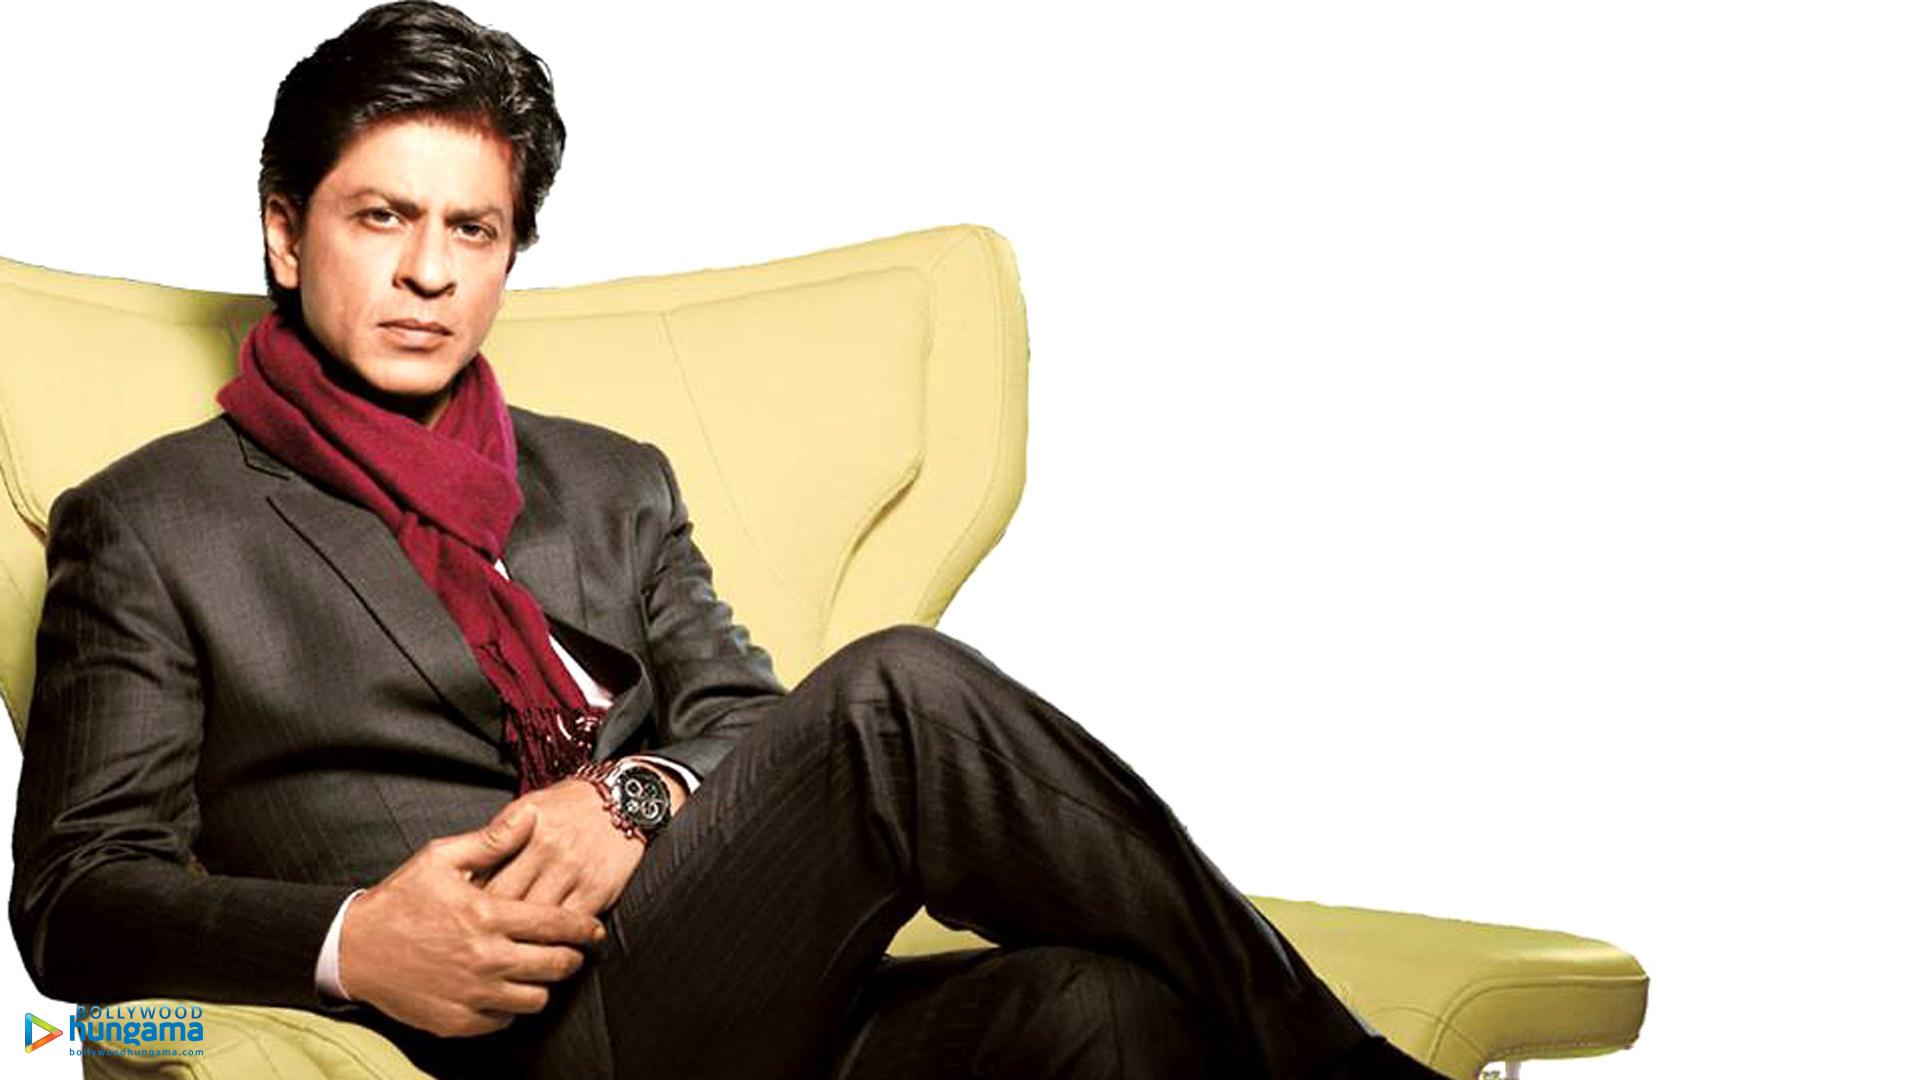 Desktop Wallpapers » Shahrukh Khan Backgrounds » Shahrukh Khan » www